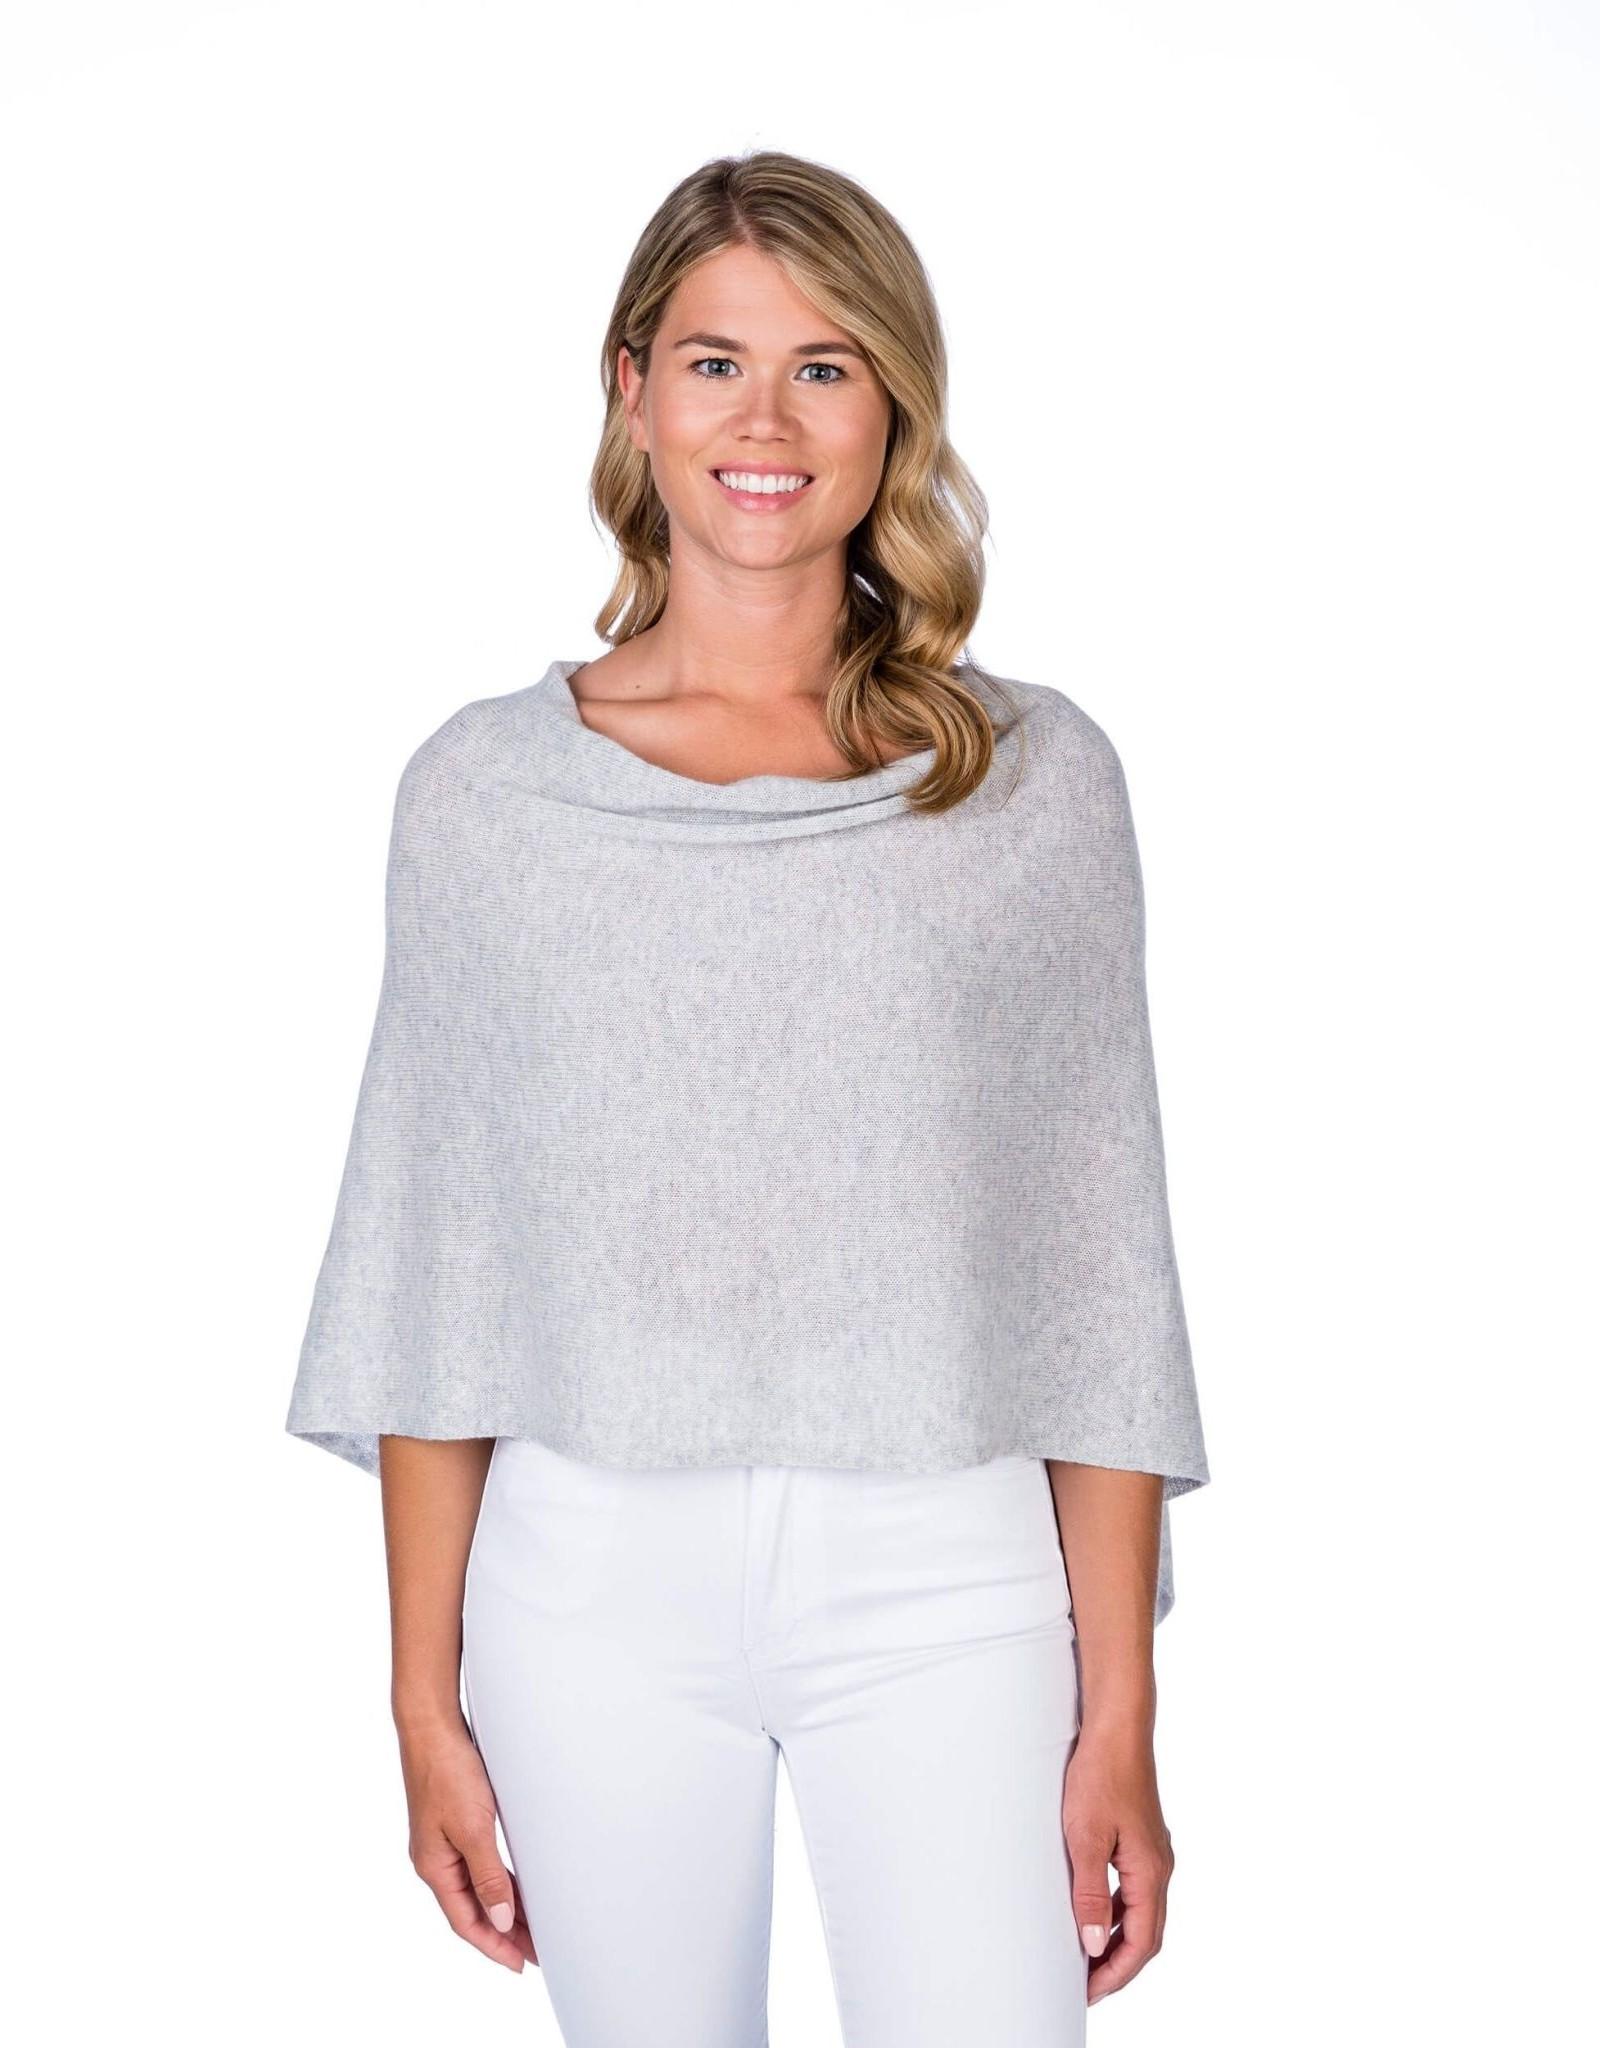 Alashan Cashmere Co. Dress Topper-Ash